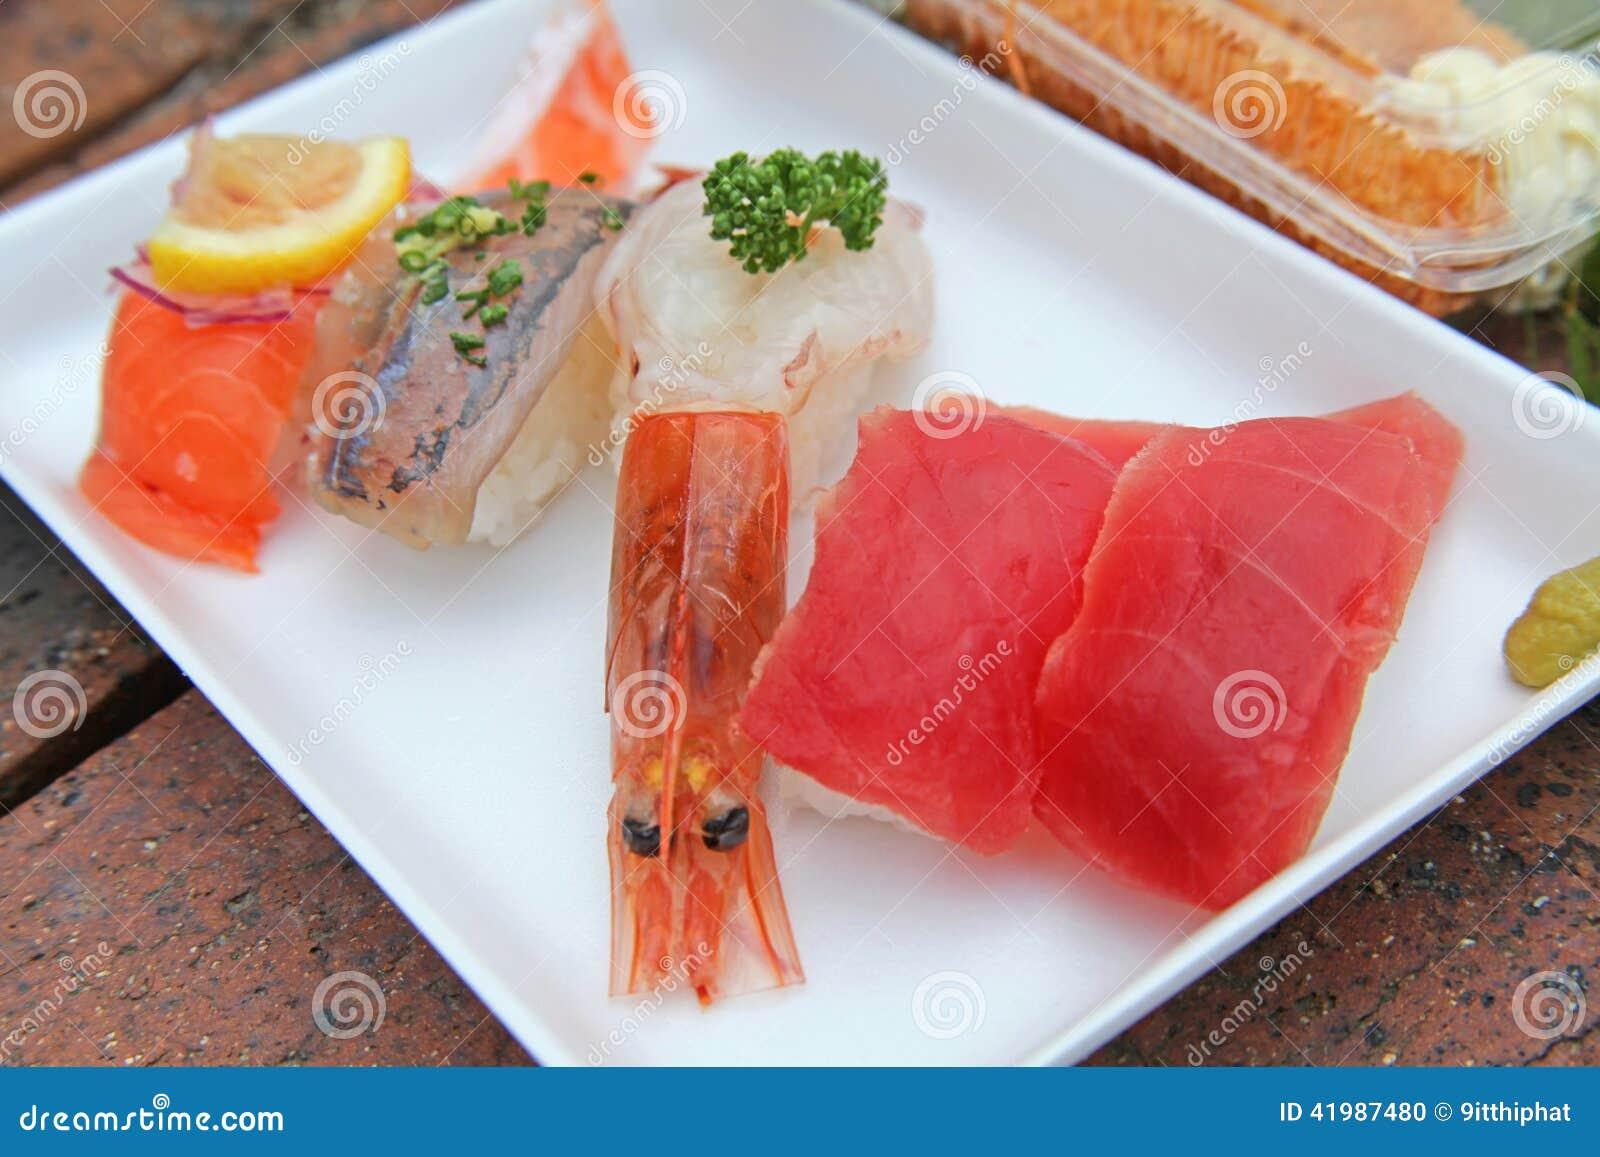 Japanese food, susi, grilled eel on rice